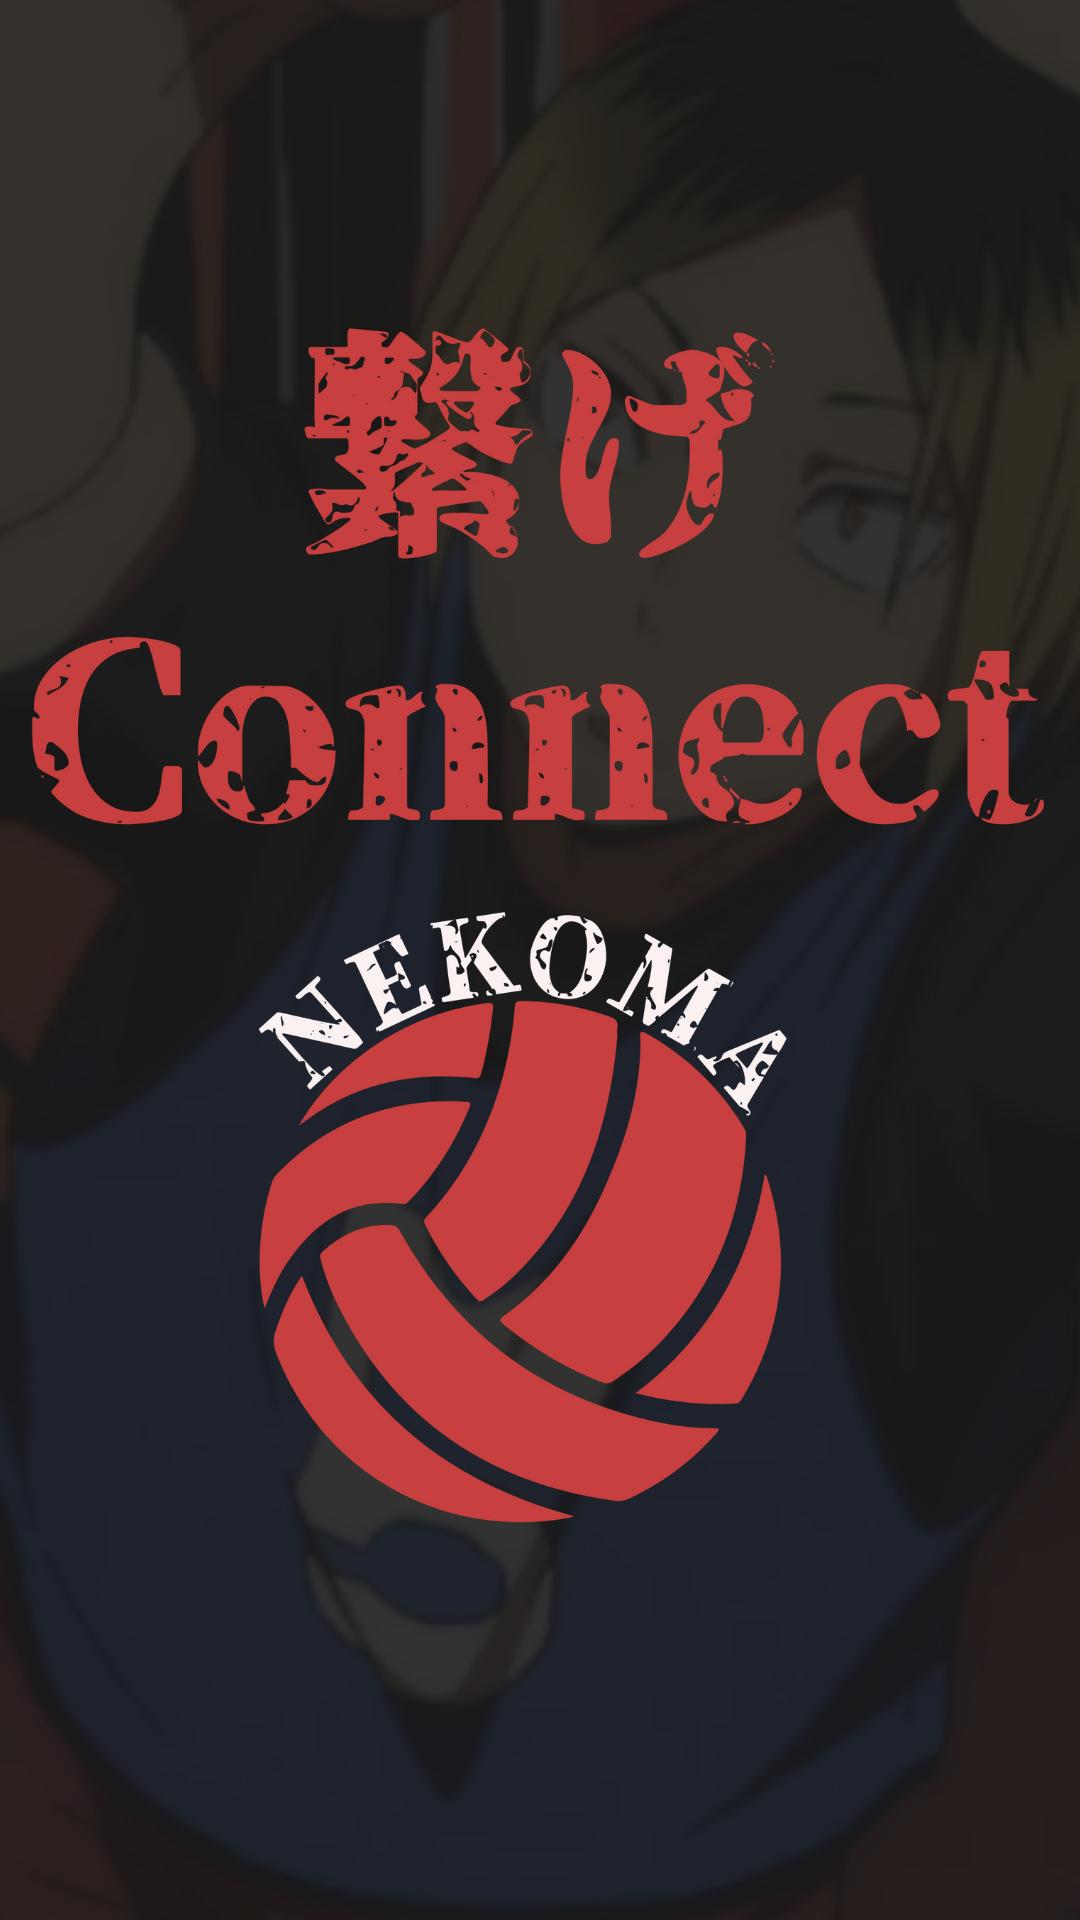 Connect Nekoma Haikyuu Shirt Haikyuu Karasuno Nekoma High Etsy In 2020 Haikyuu Nekoma Haikyuu Haikyuu Anime